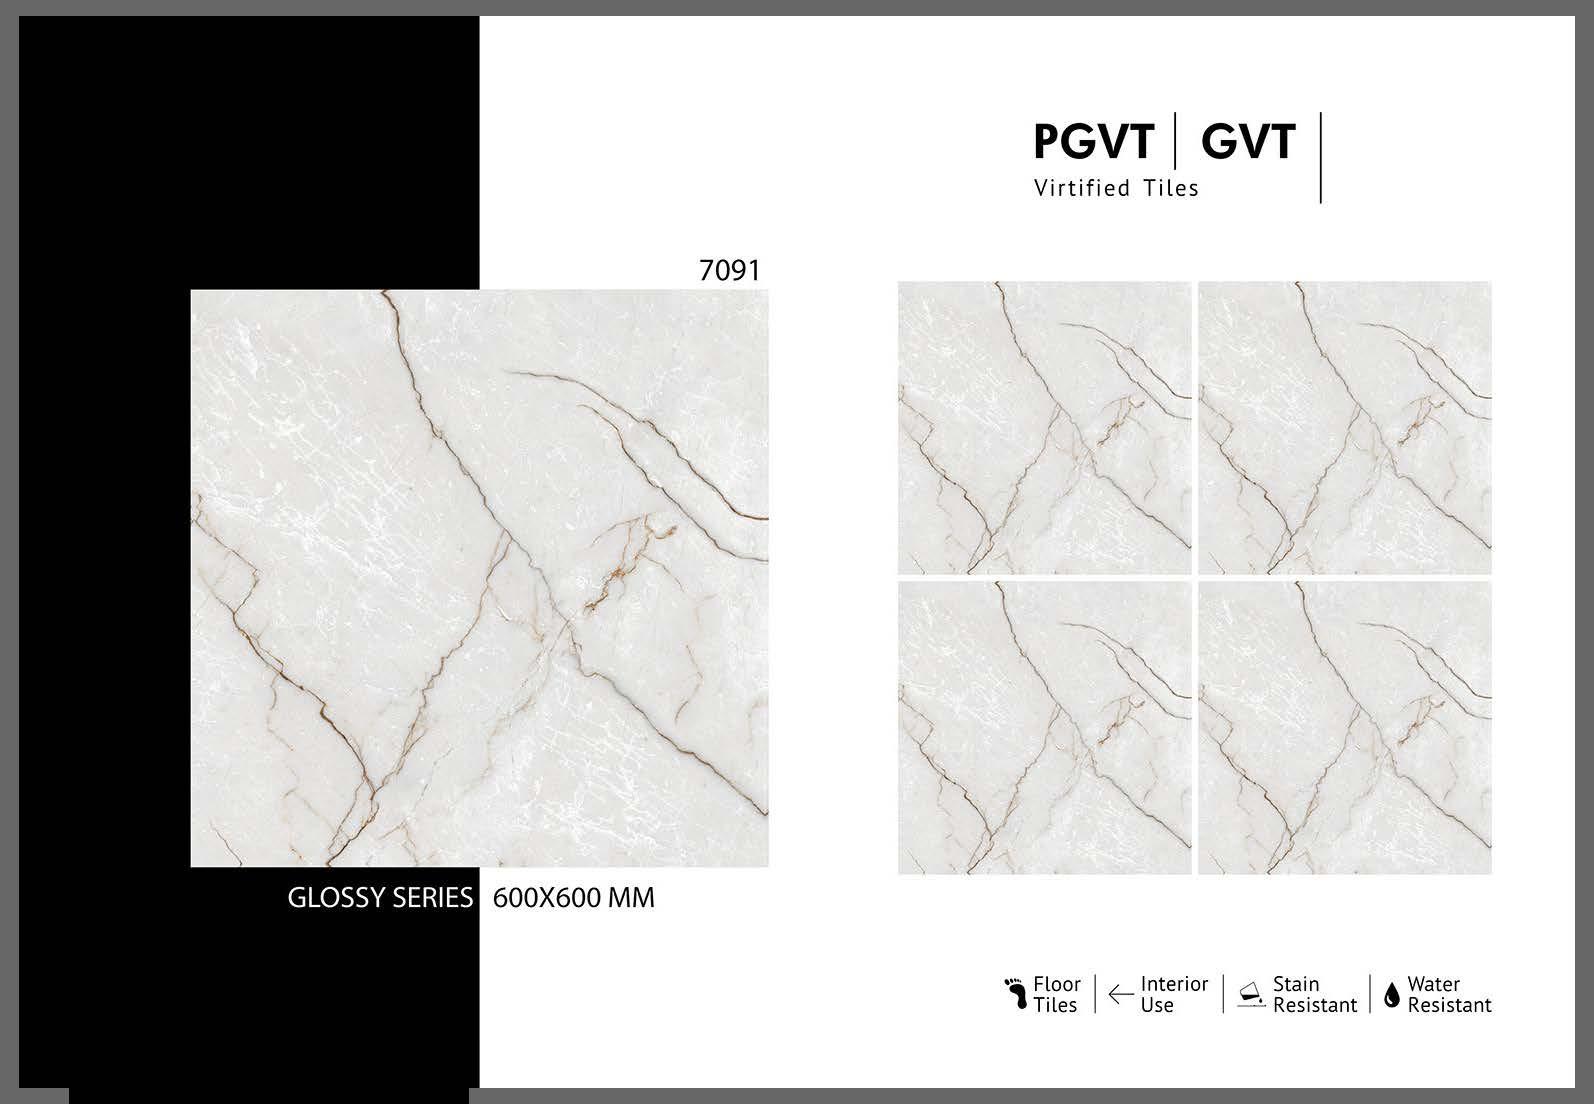 GVT 2X2 GLOSSY_Page_78.jpg